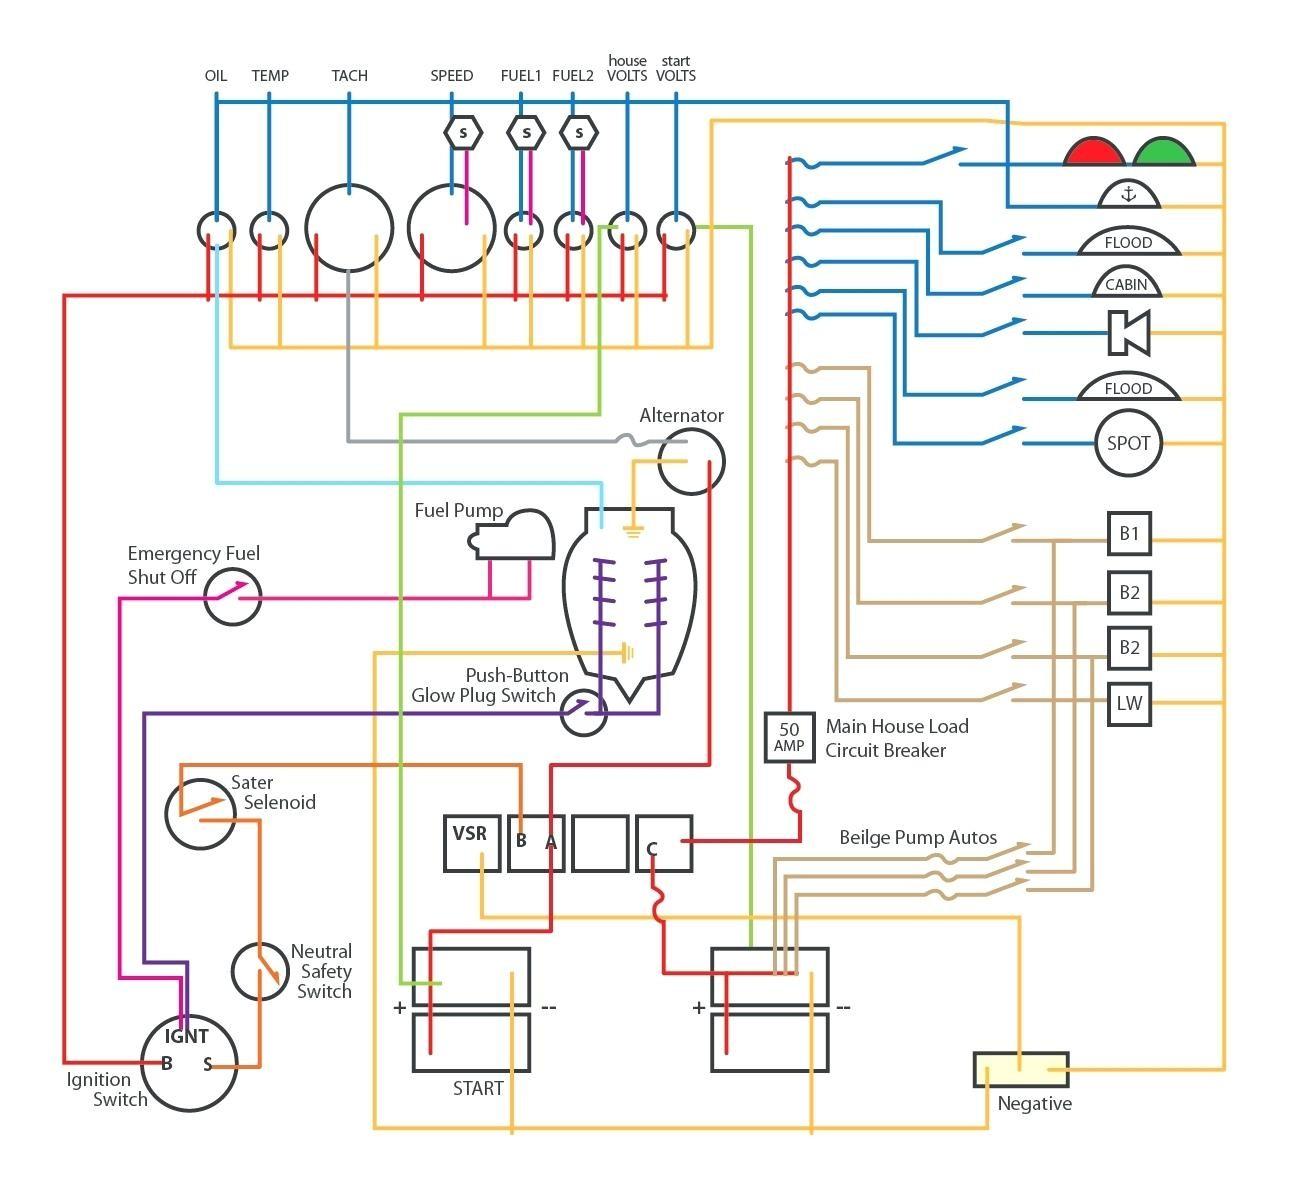 Phoenix Boat Wiring Diagram Smart Diagrams 12 Volt Ignition Switch Best Of Image Rh Mainetreasurechest Com Light